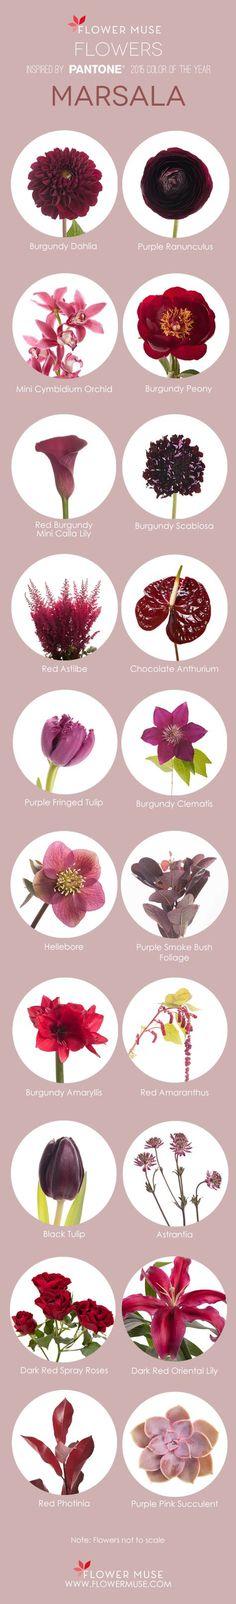 http://www.flowermuse.com/blog/wp-content/uploads/2015/01/marsala-flowers.jpg